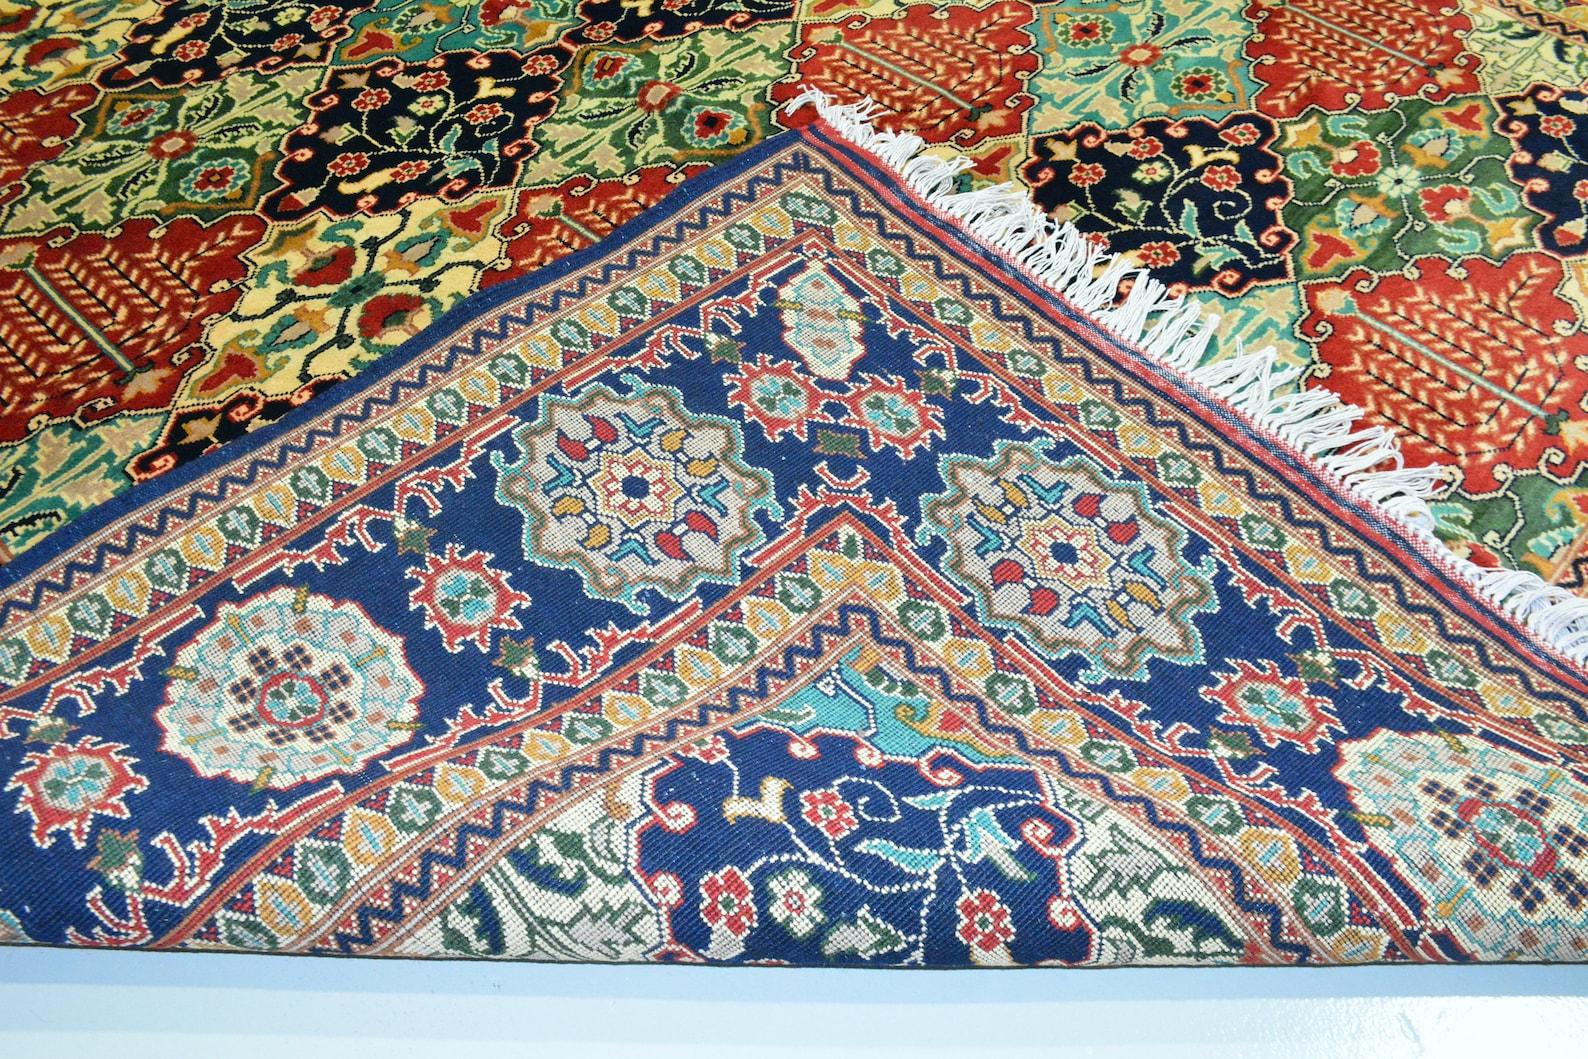 Living Room Size Merinos Afghan Handmade Rug Made with ...